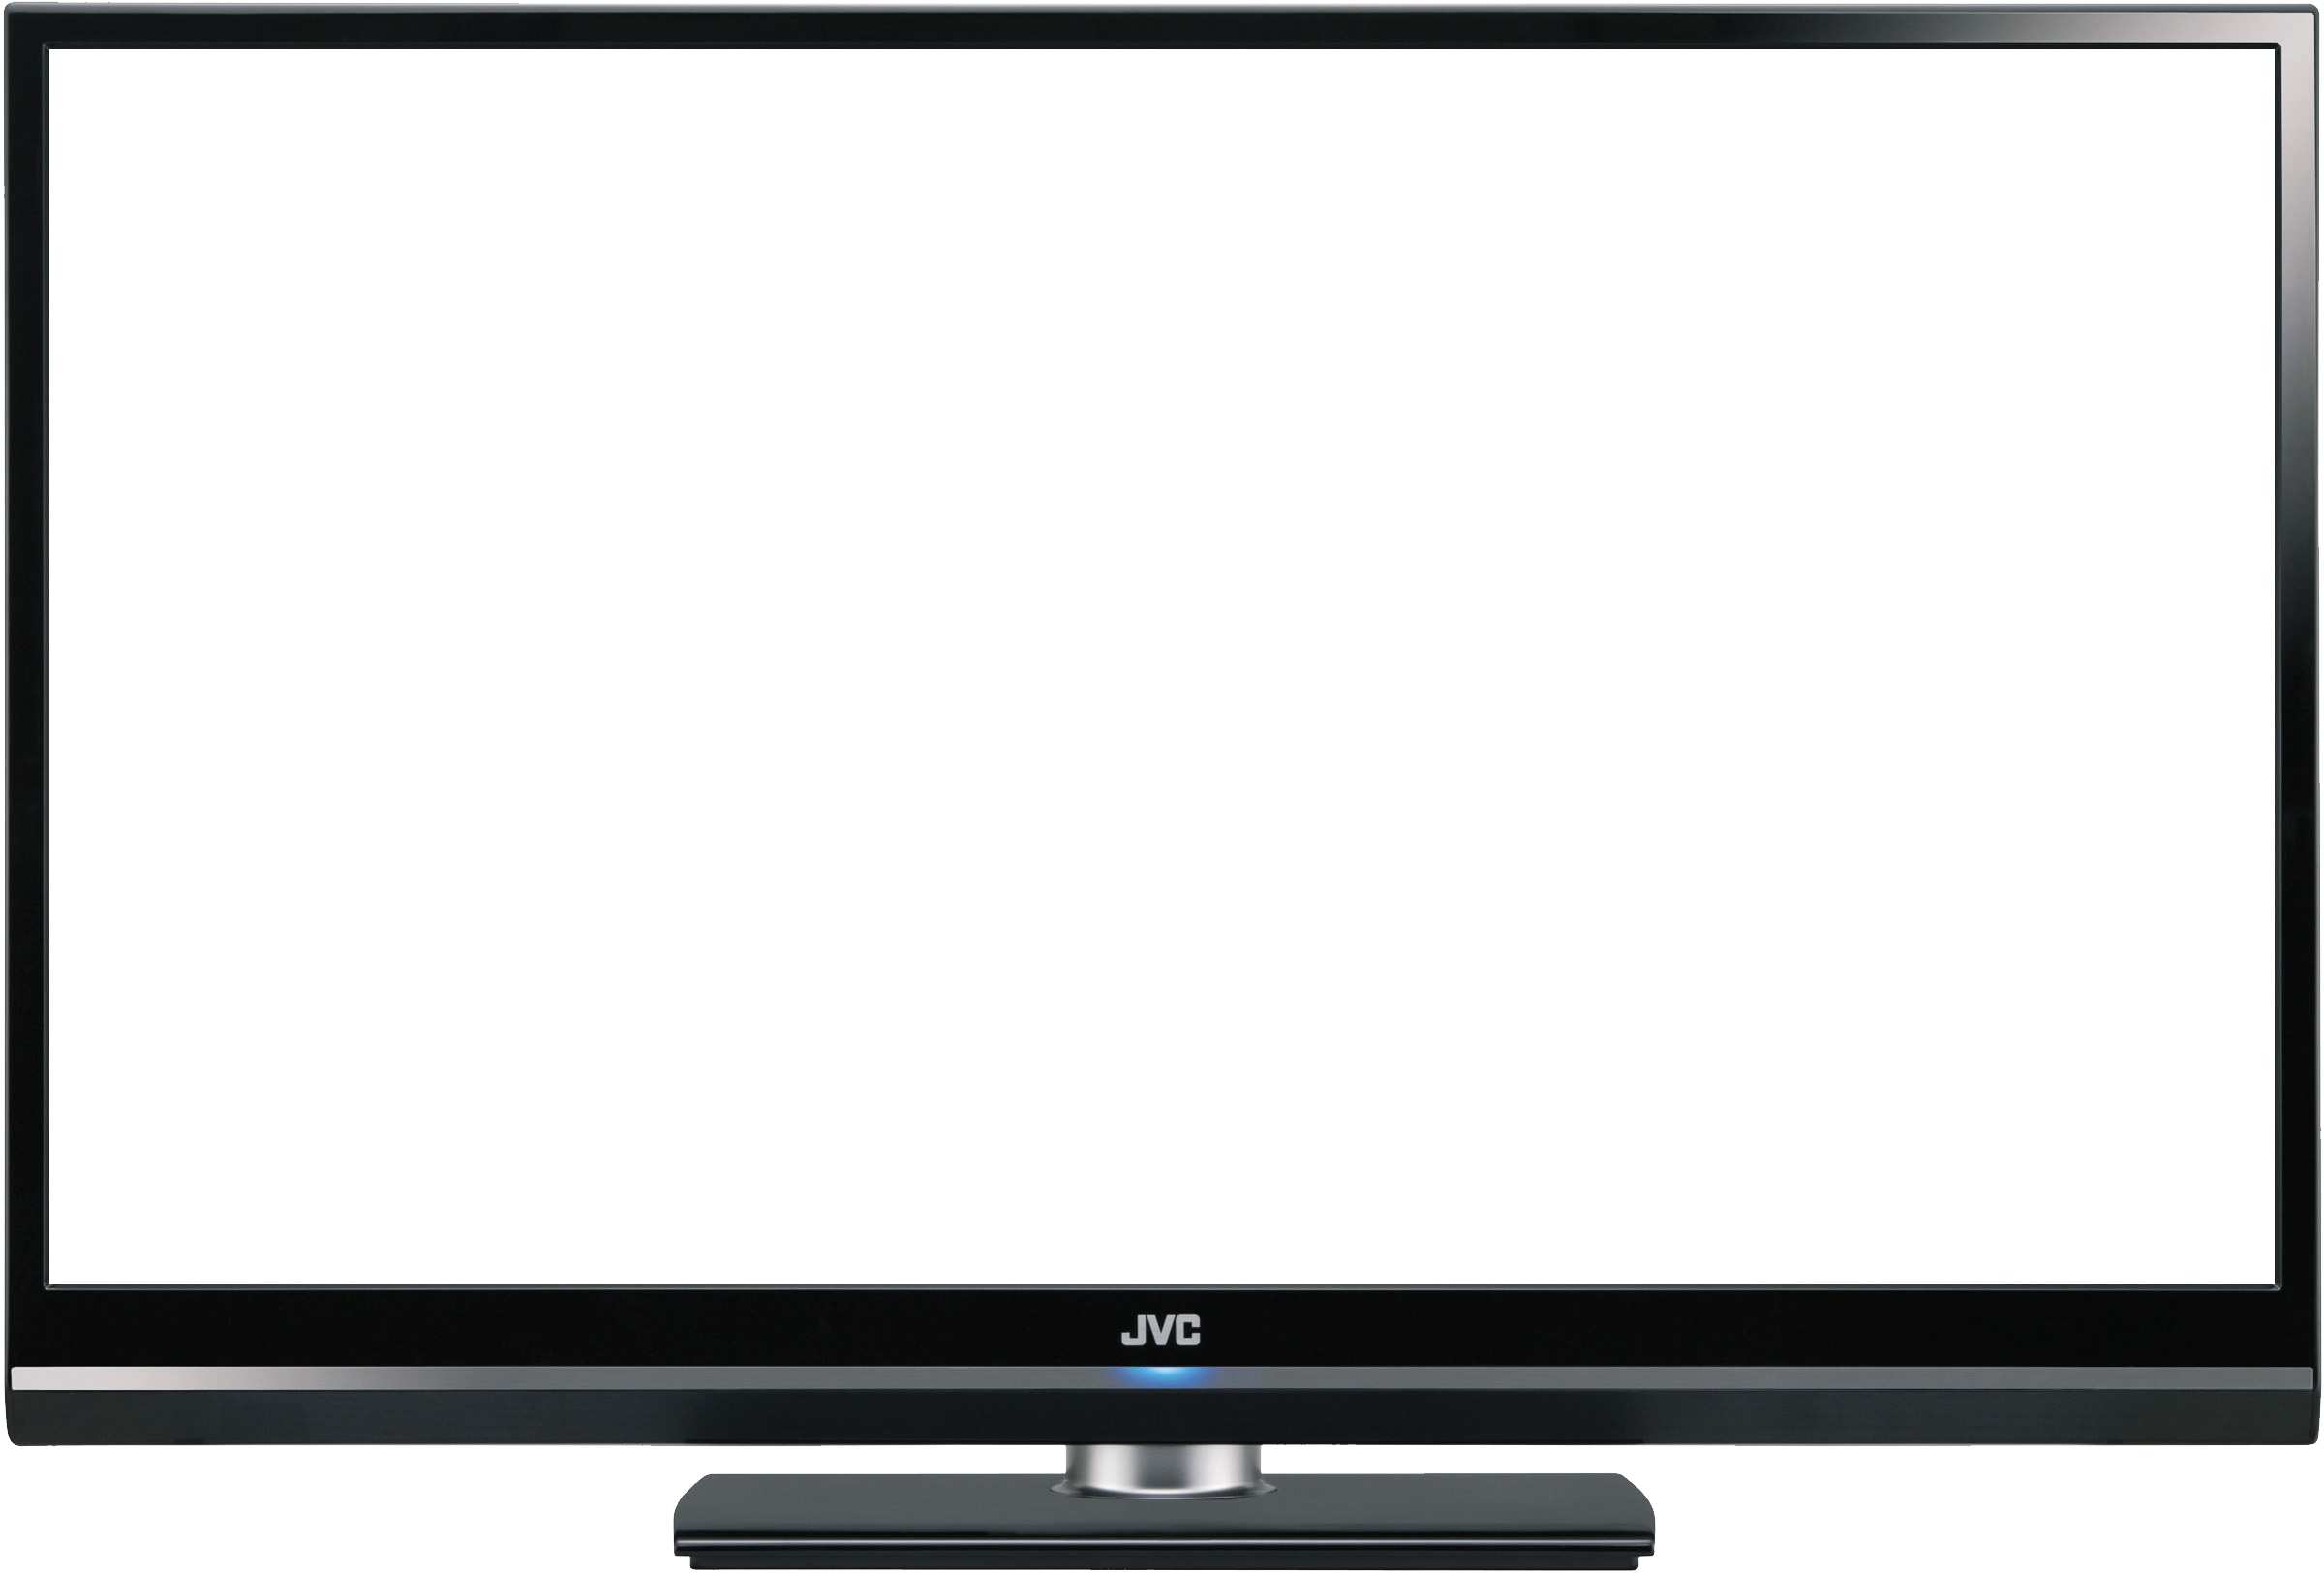 Monitor PNG - 1508